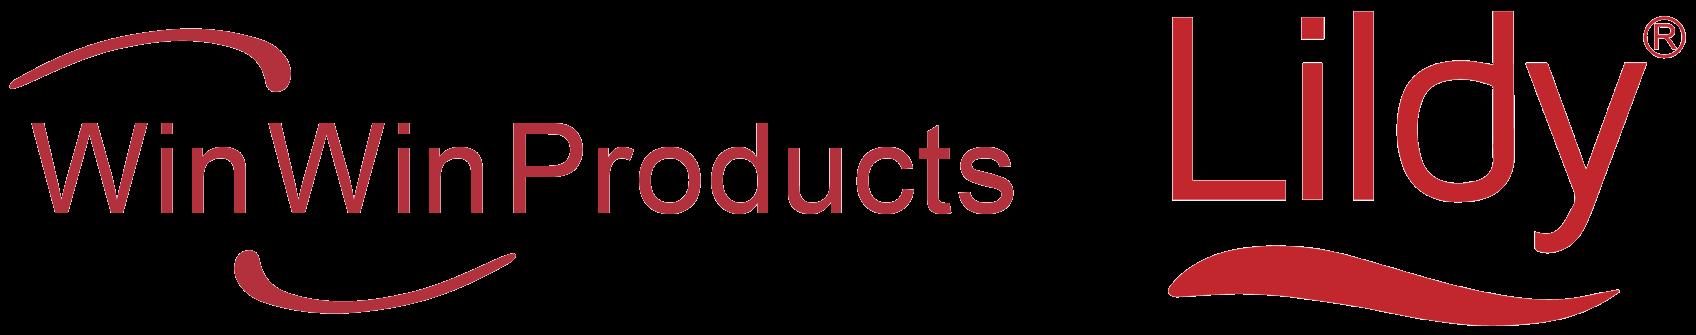 WinWin Products